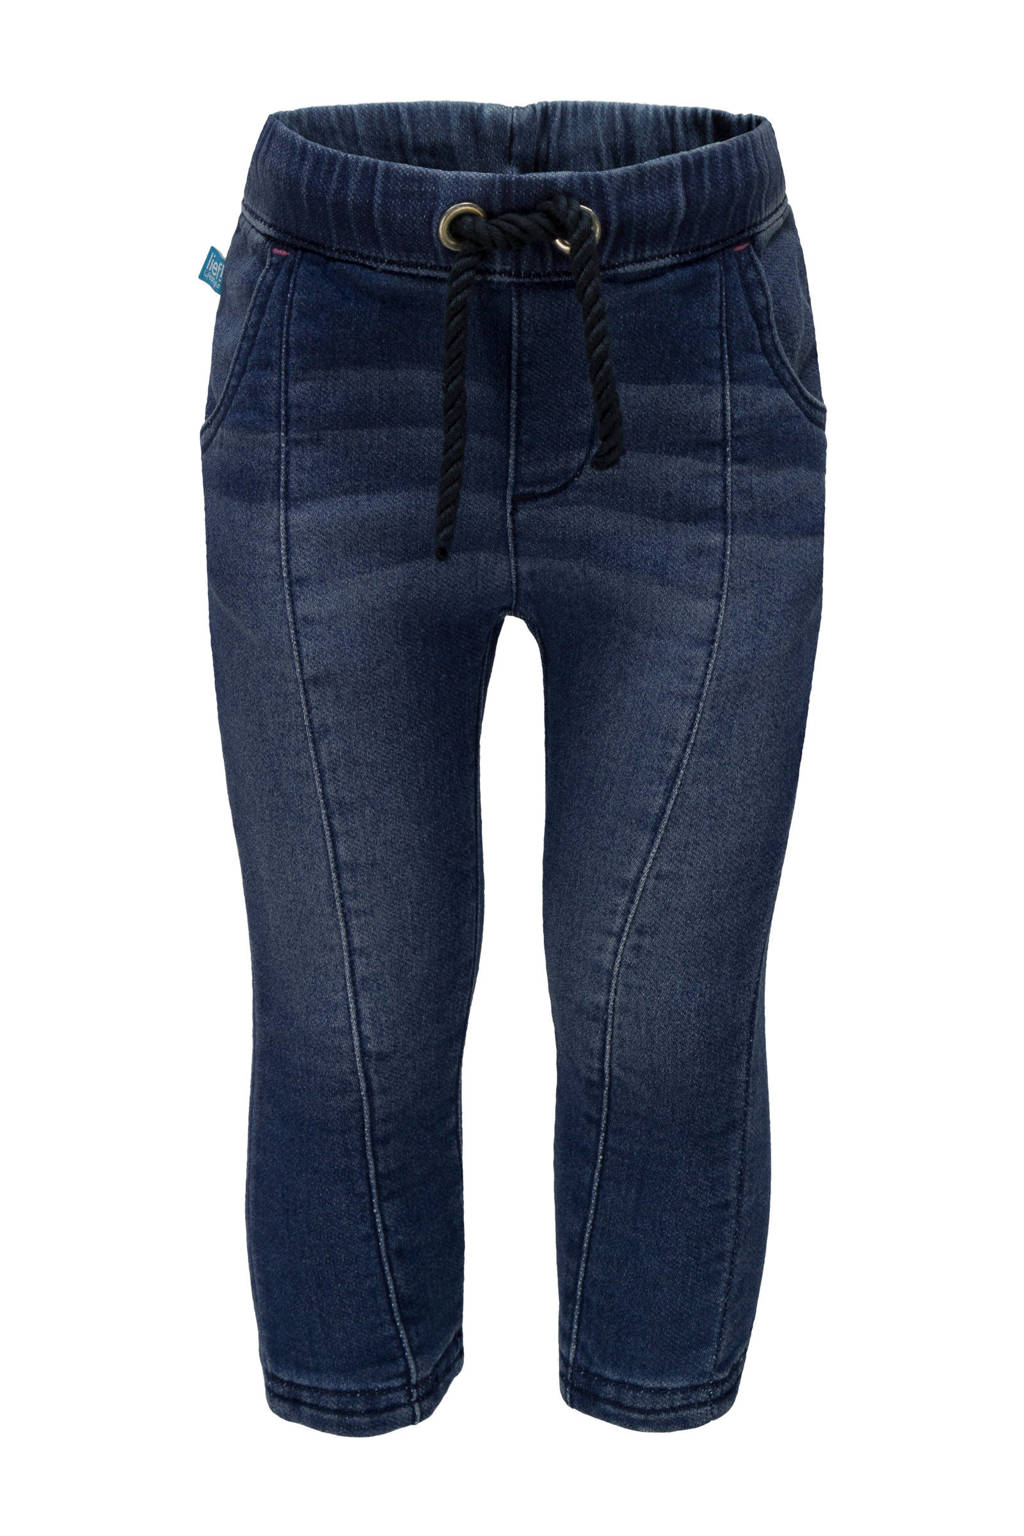 lief! slim fit jeans, Dark denim